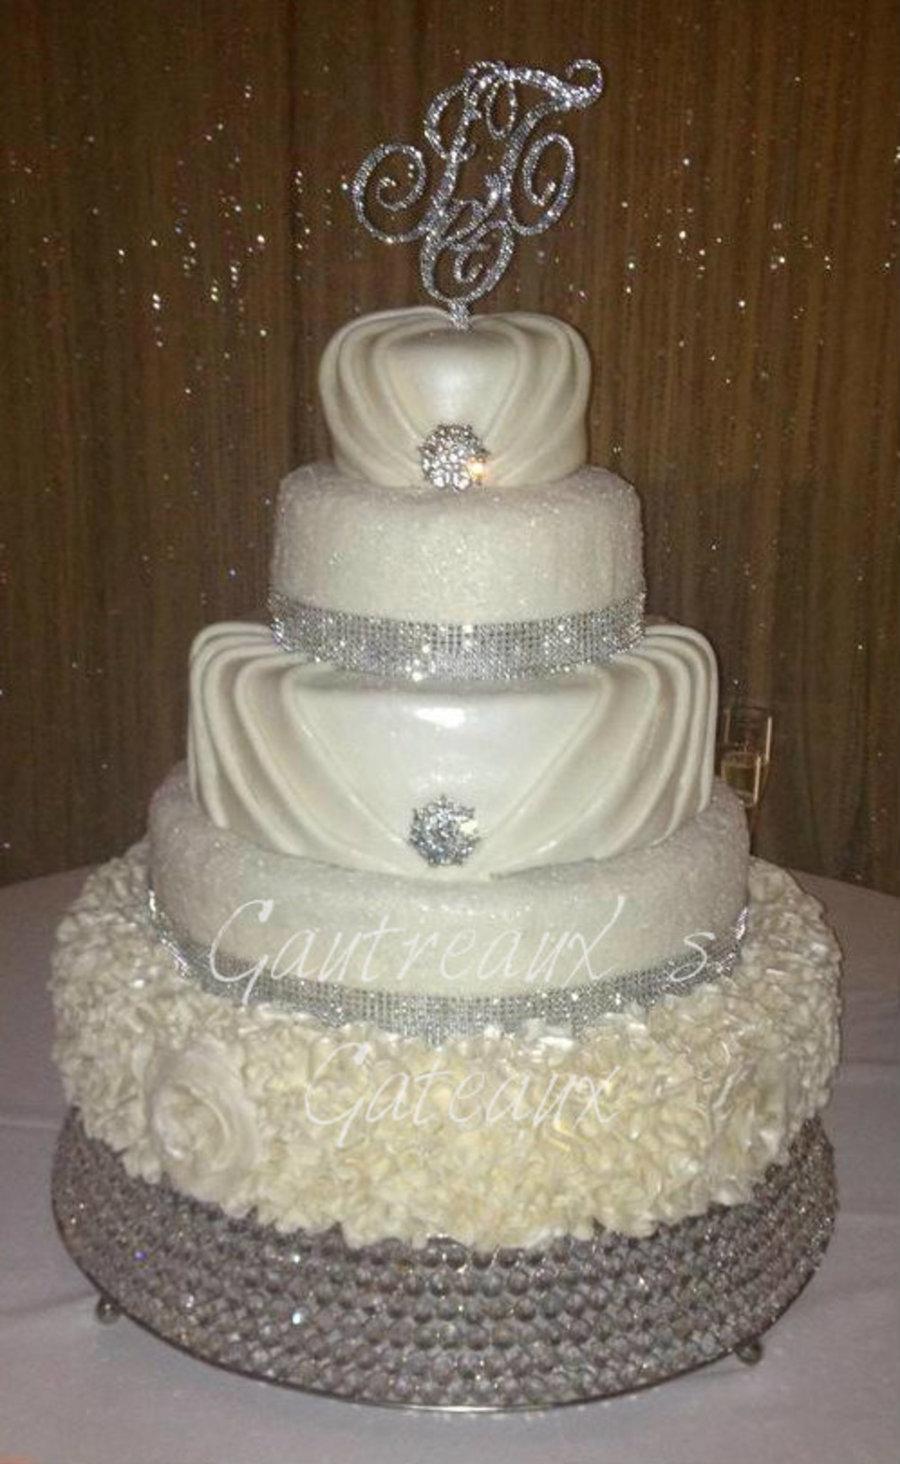 My Wedding Cake Dress Inspired